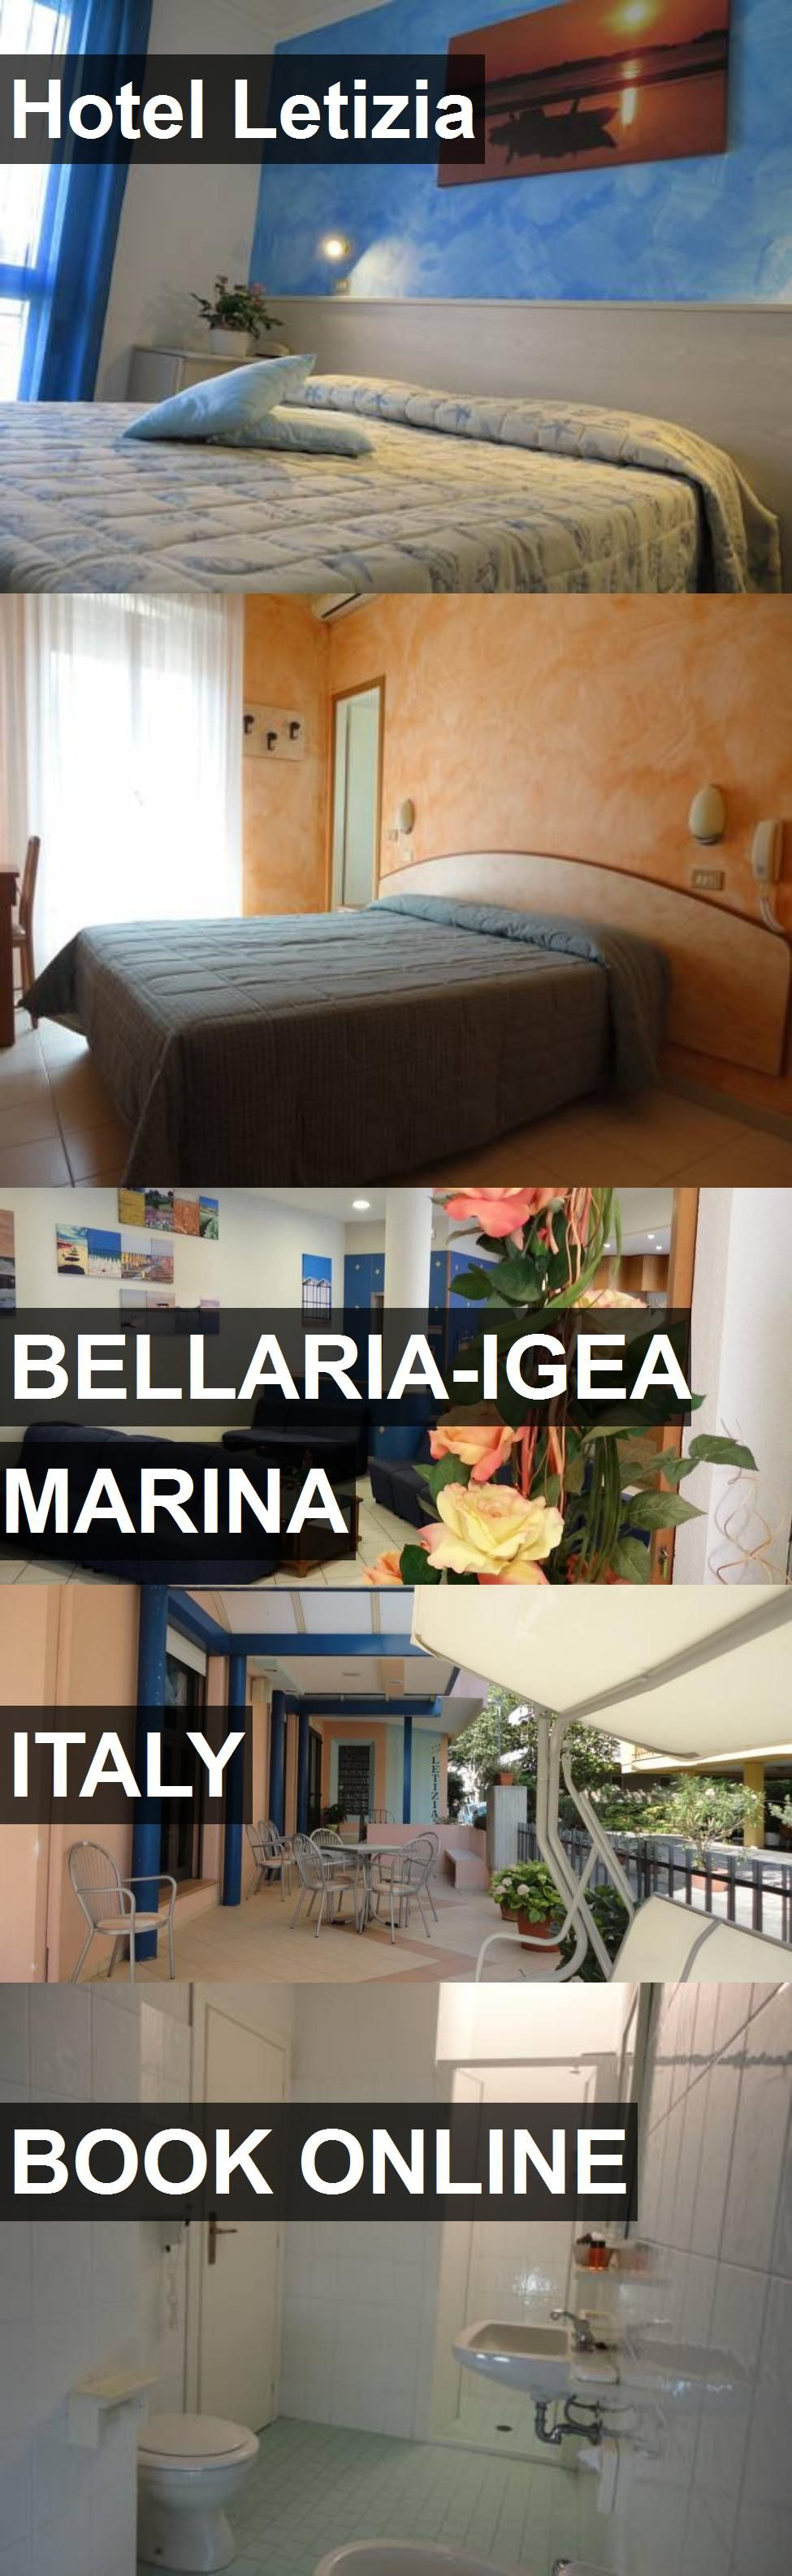 Hotel Letizia in BellariaIgea Marina, Italy. For more